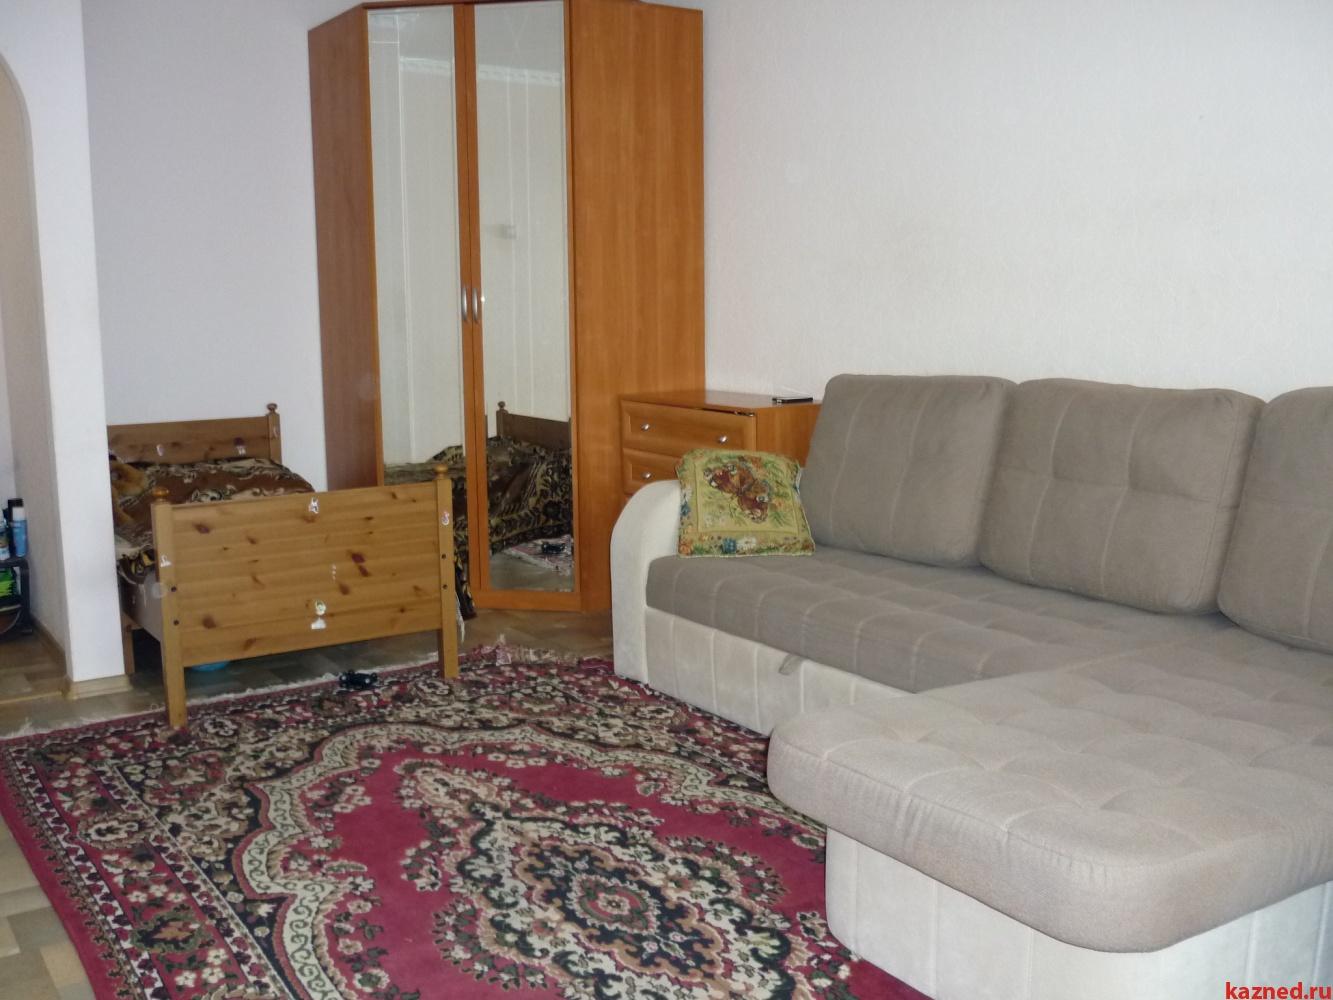 Продажа 1-к квартиры Фатыха Амирхана д.53б, 38 м² (миниатюра №10)